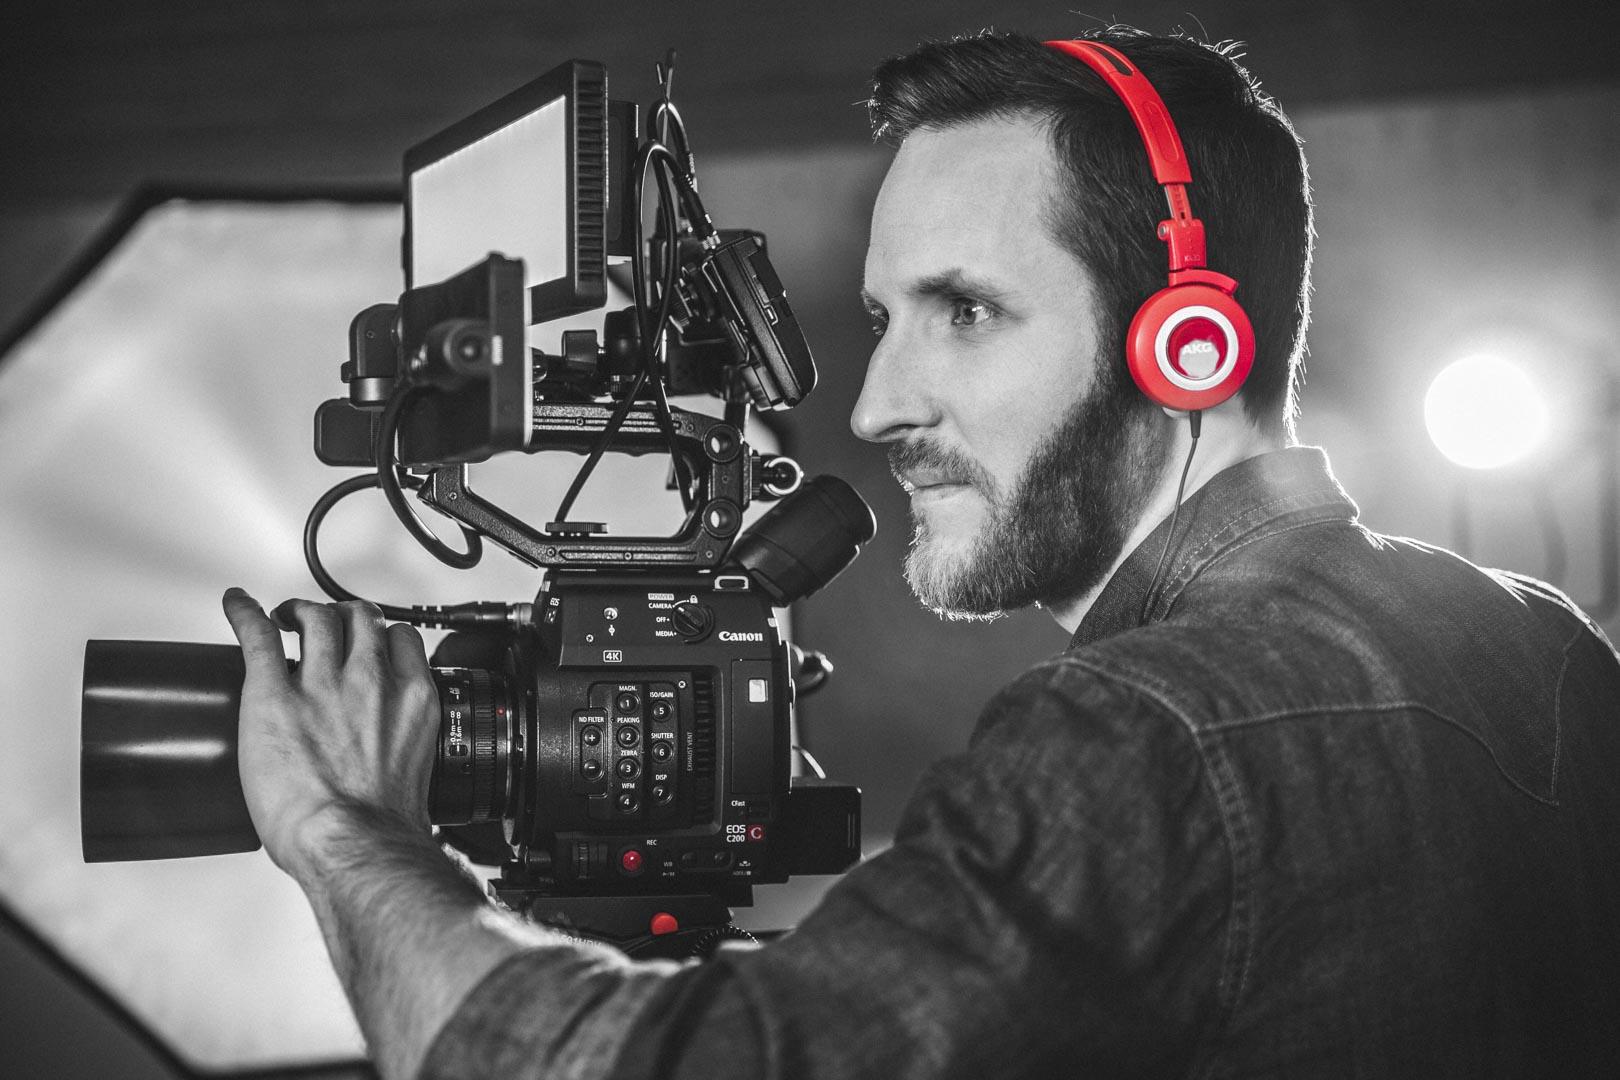 Kameramann - Kamerateams - Dominik Hörner